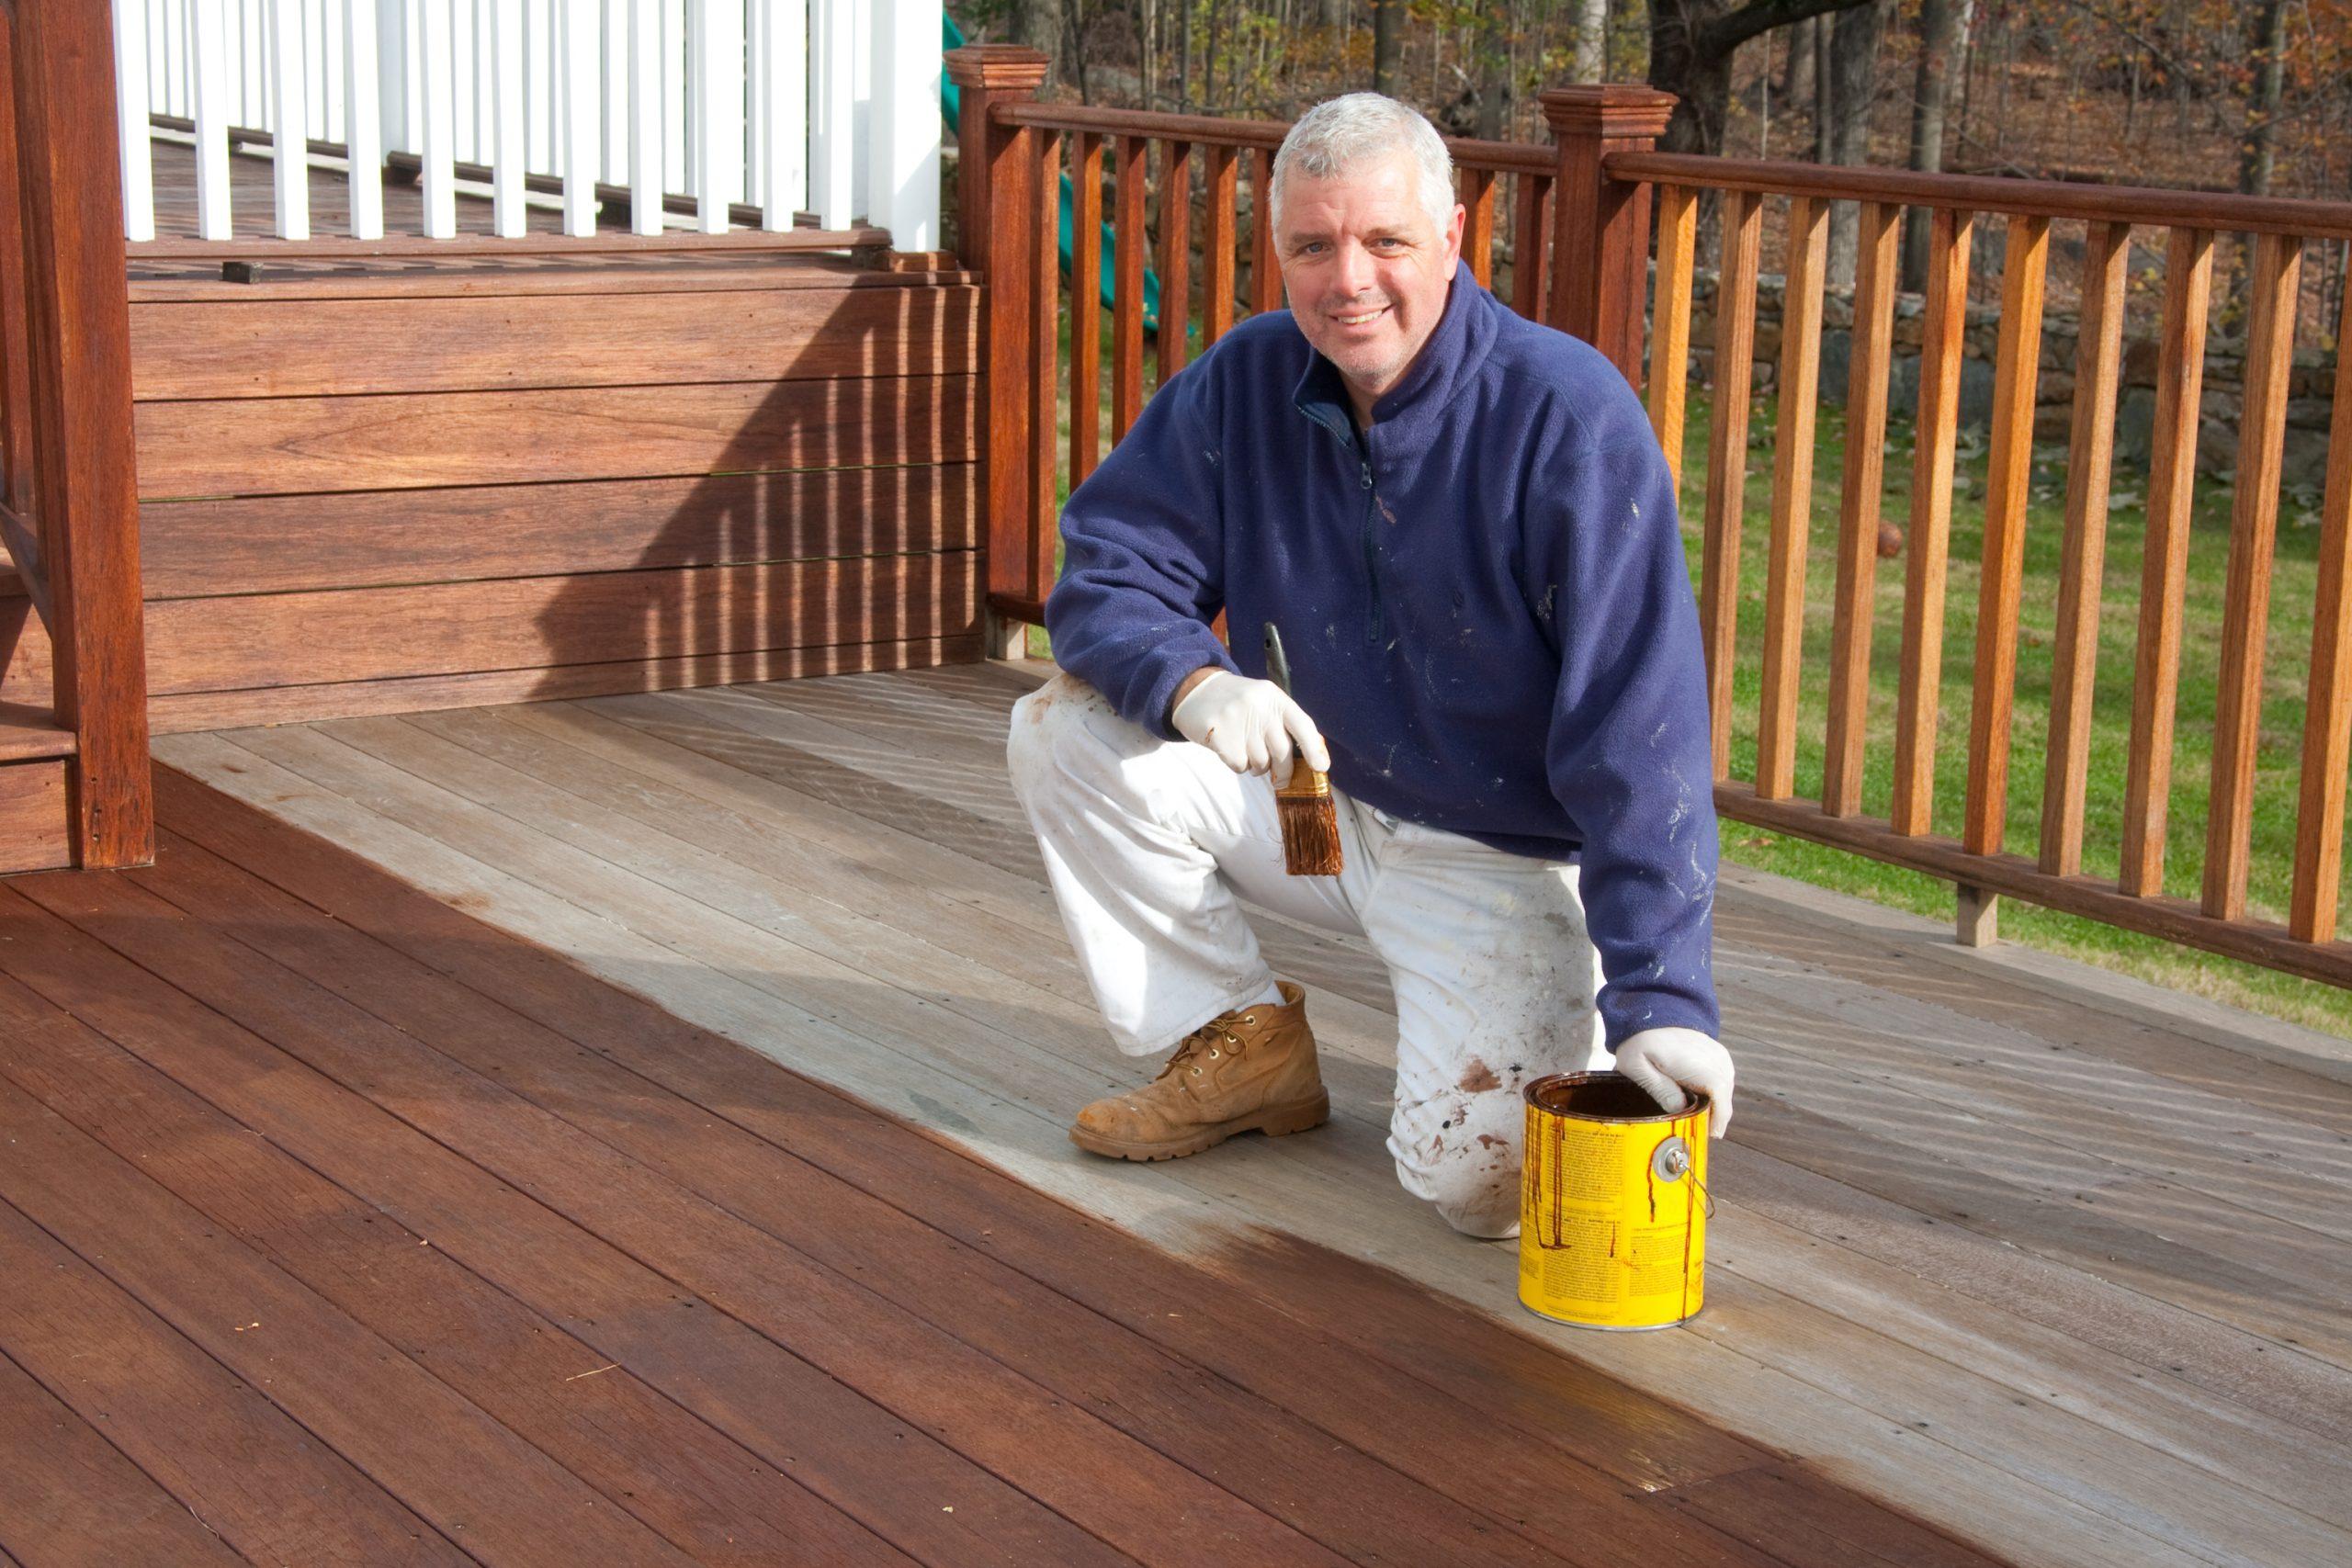 deck stain seal deck builder contractor little rock north little rock jacksonville cabot sherwood arkansas ar nlr lr